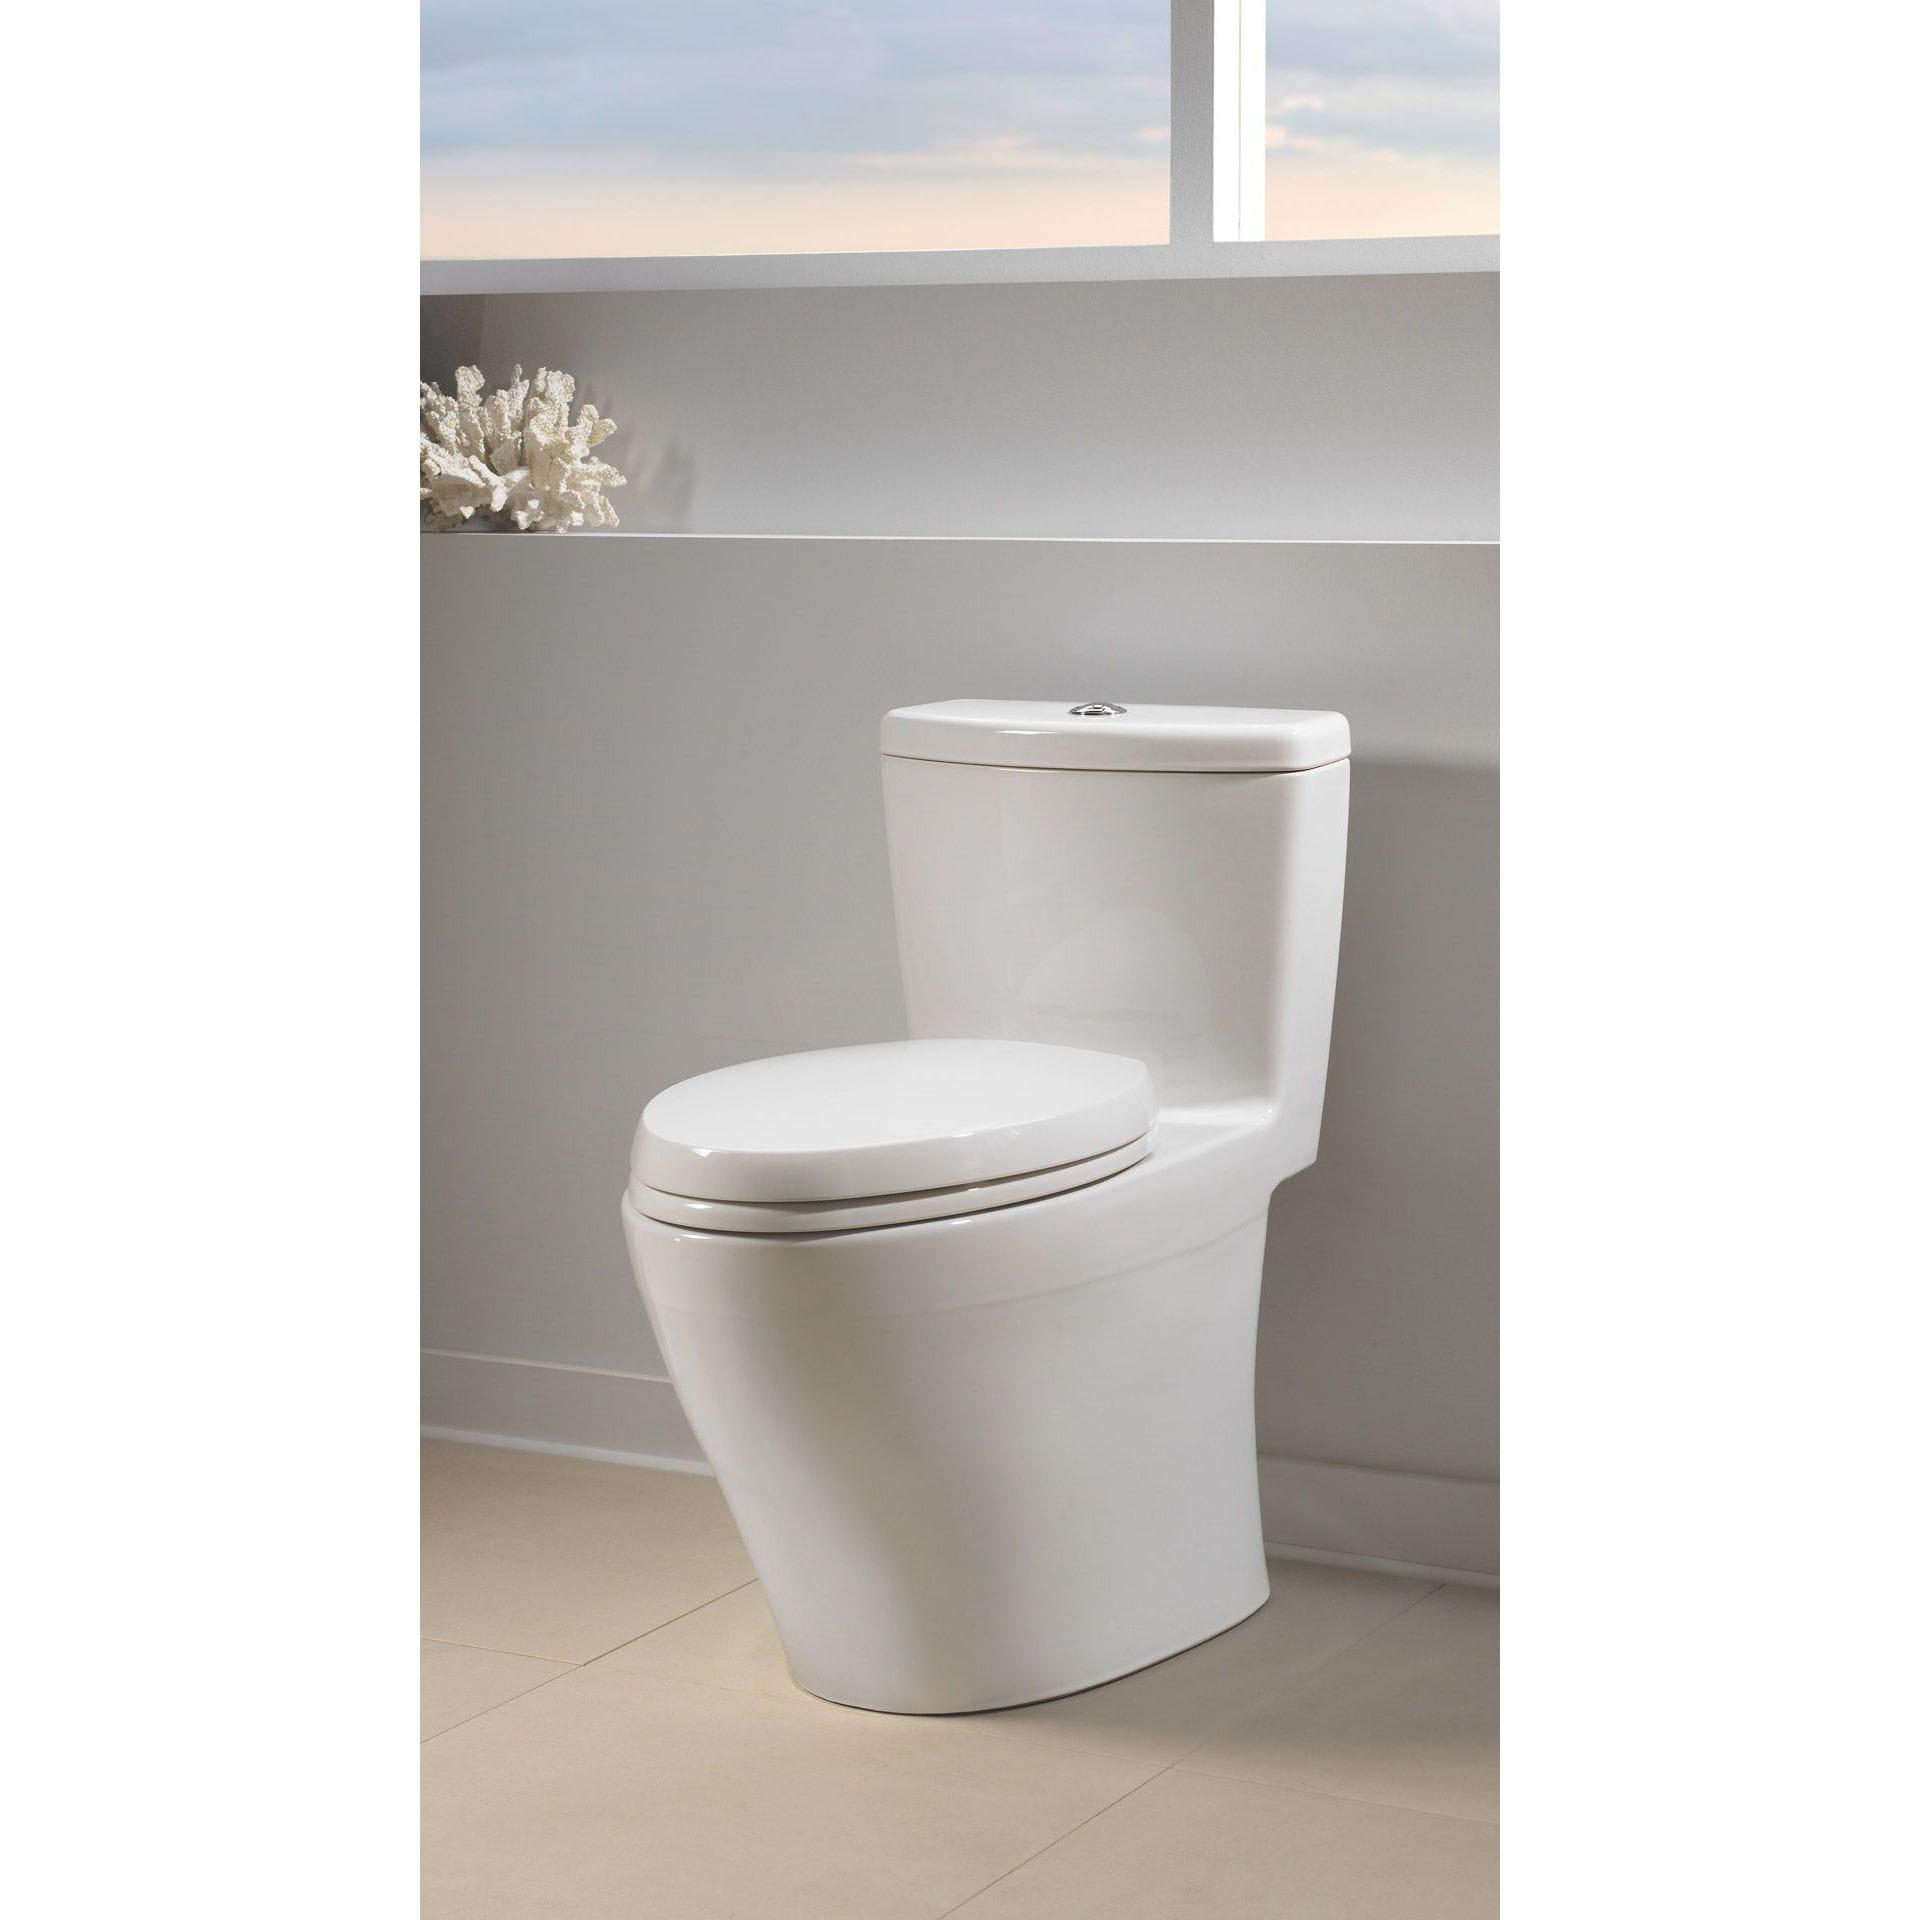 TOTO 'MS654114MF-01' Cotton White Elongated Toilet - Free Shipping ...